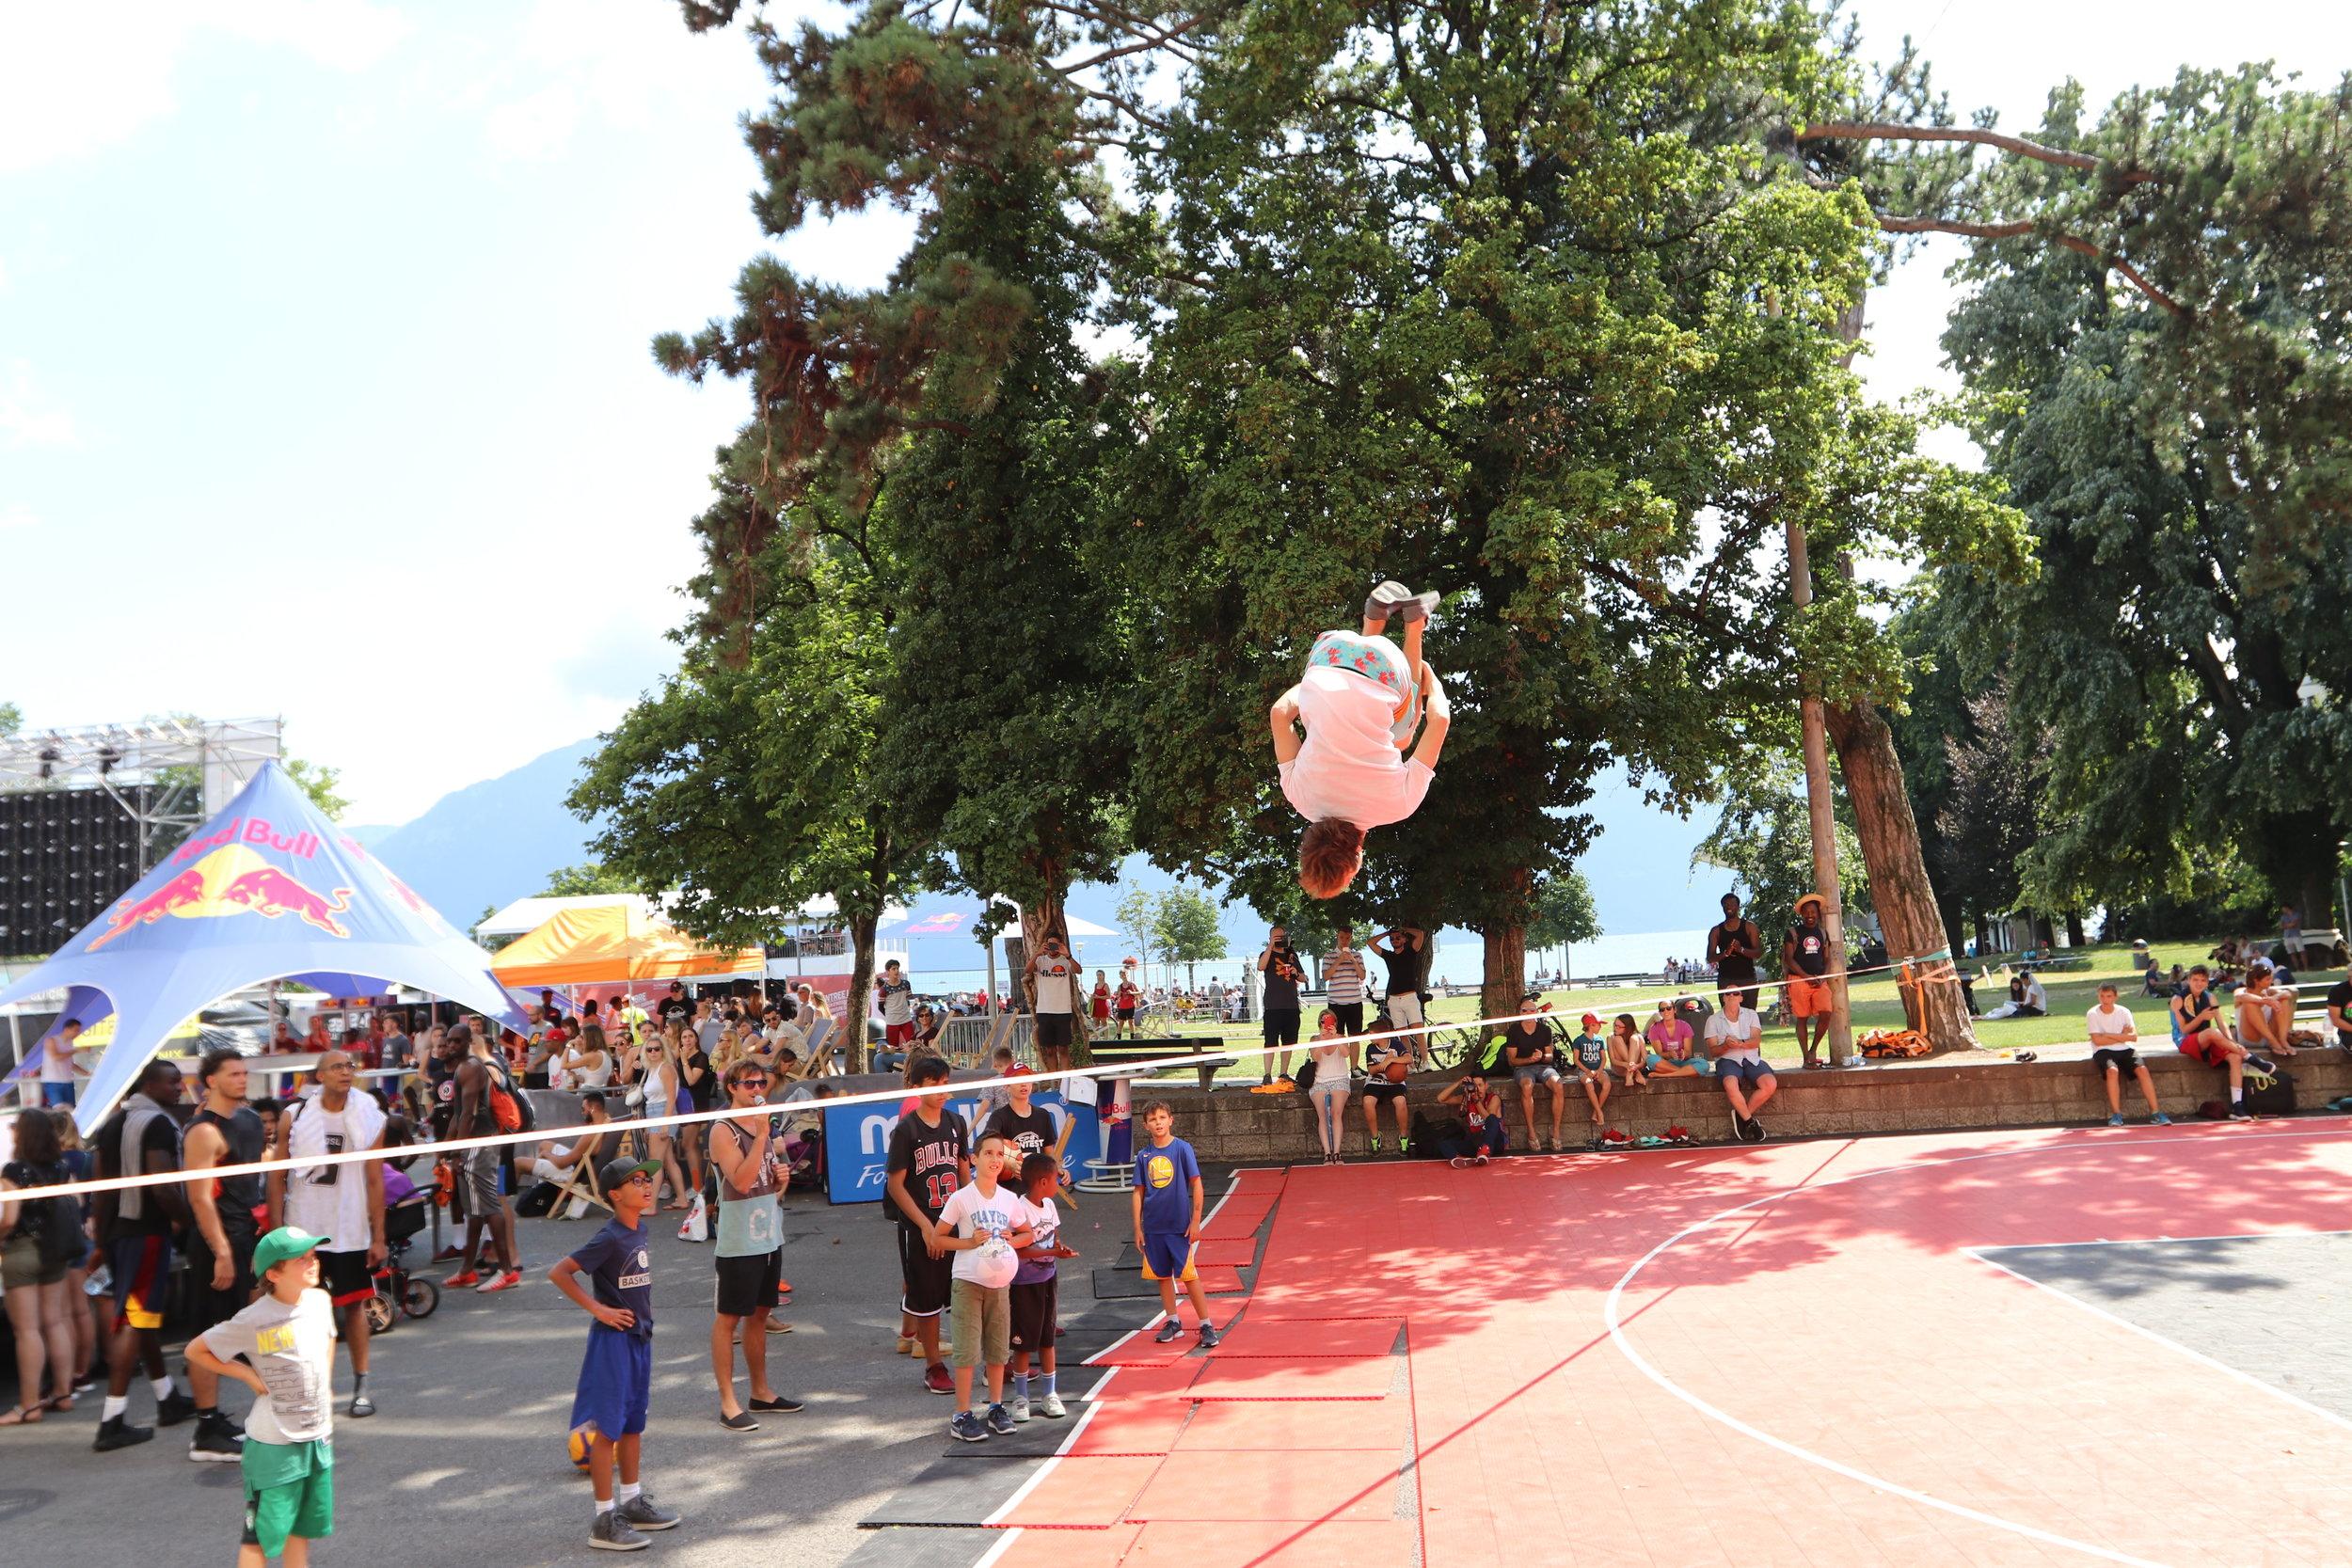 Urban project vevey highline trickline show funambule circus performance spectacle ecole suisse Slackline Lyell Grunberg  (3).JPG